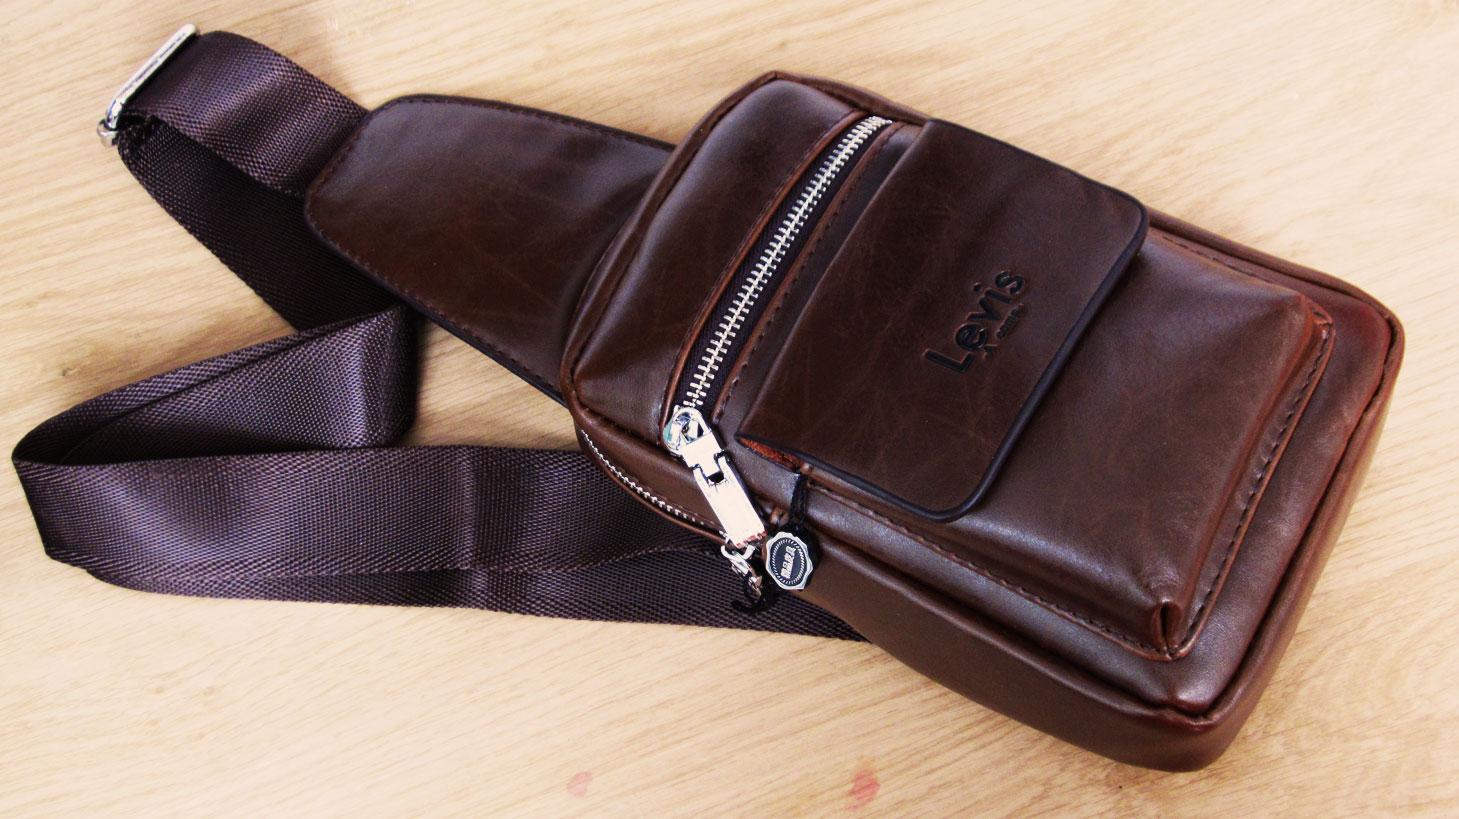 Jual tas selempang pria kulit asli levis bodypack import premium ... 0e1943a107